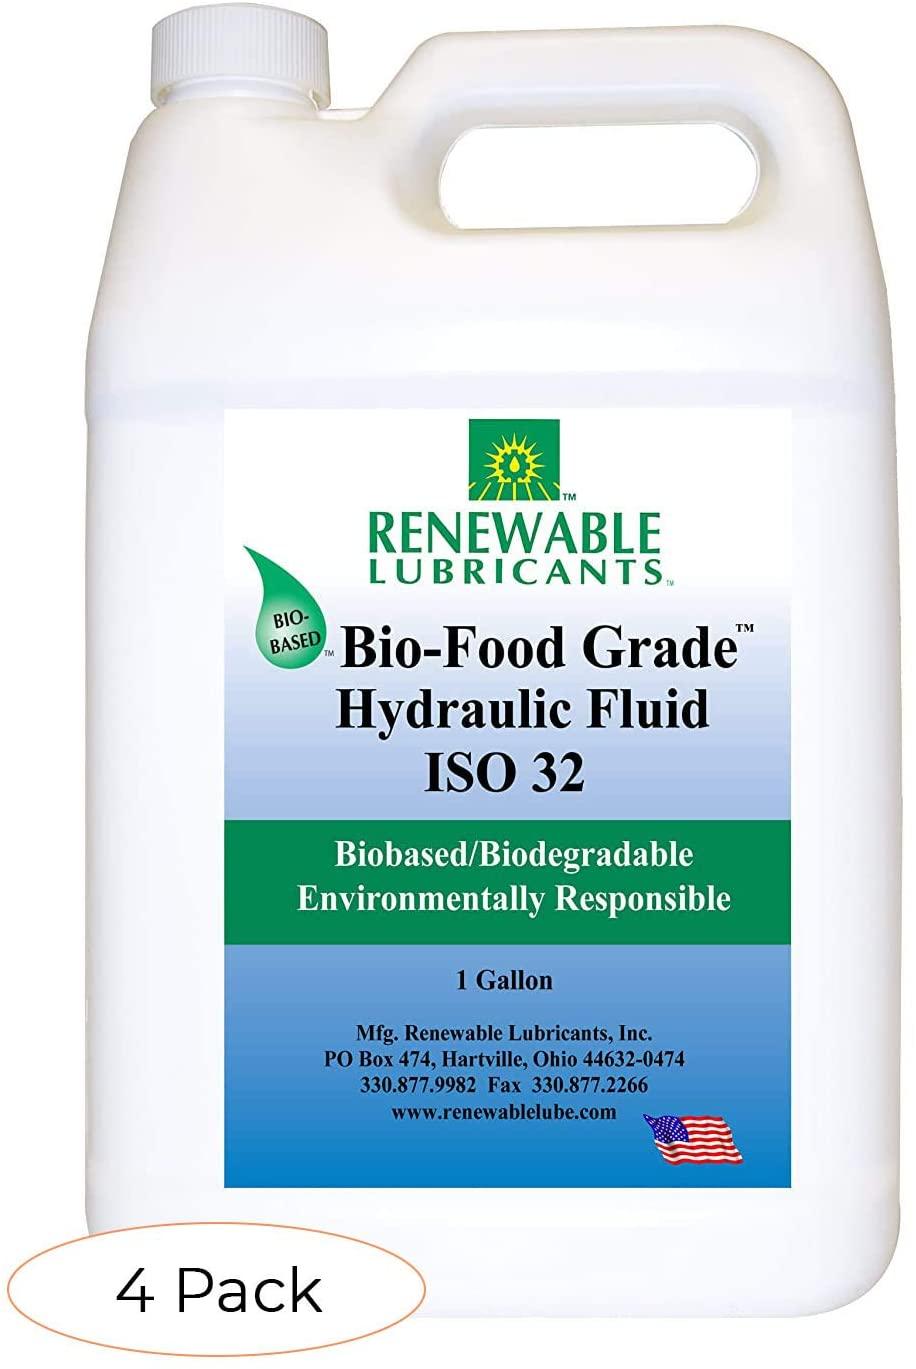 Renewable Lubricants Bio-Food Grade ISO 32 Hydraulic Fluid, 1 Gallon Jug (87123), Yellow (Fоur Расk)